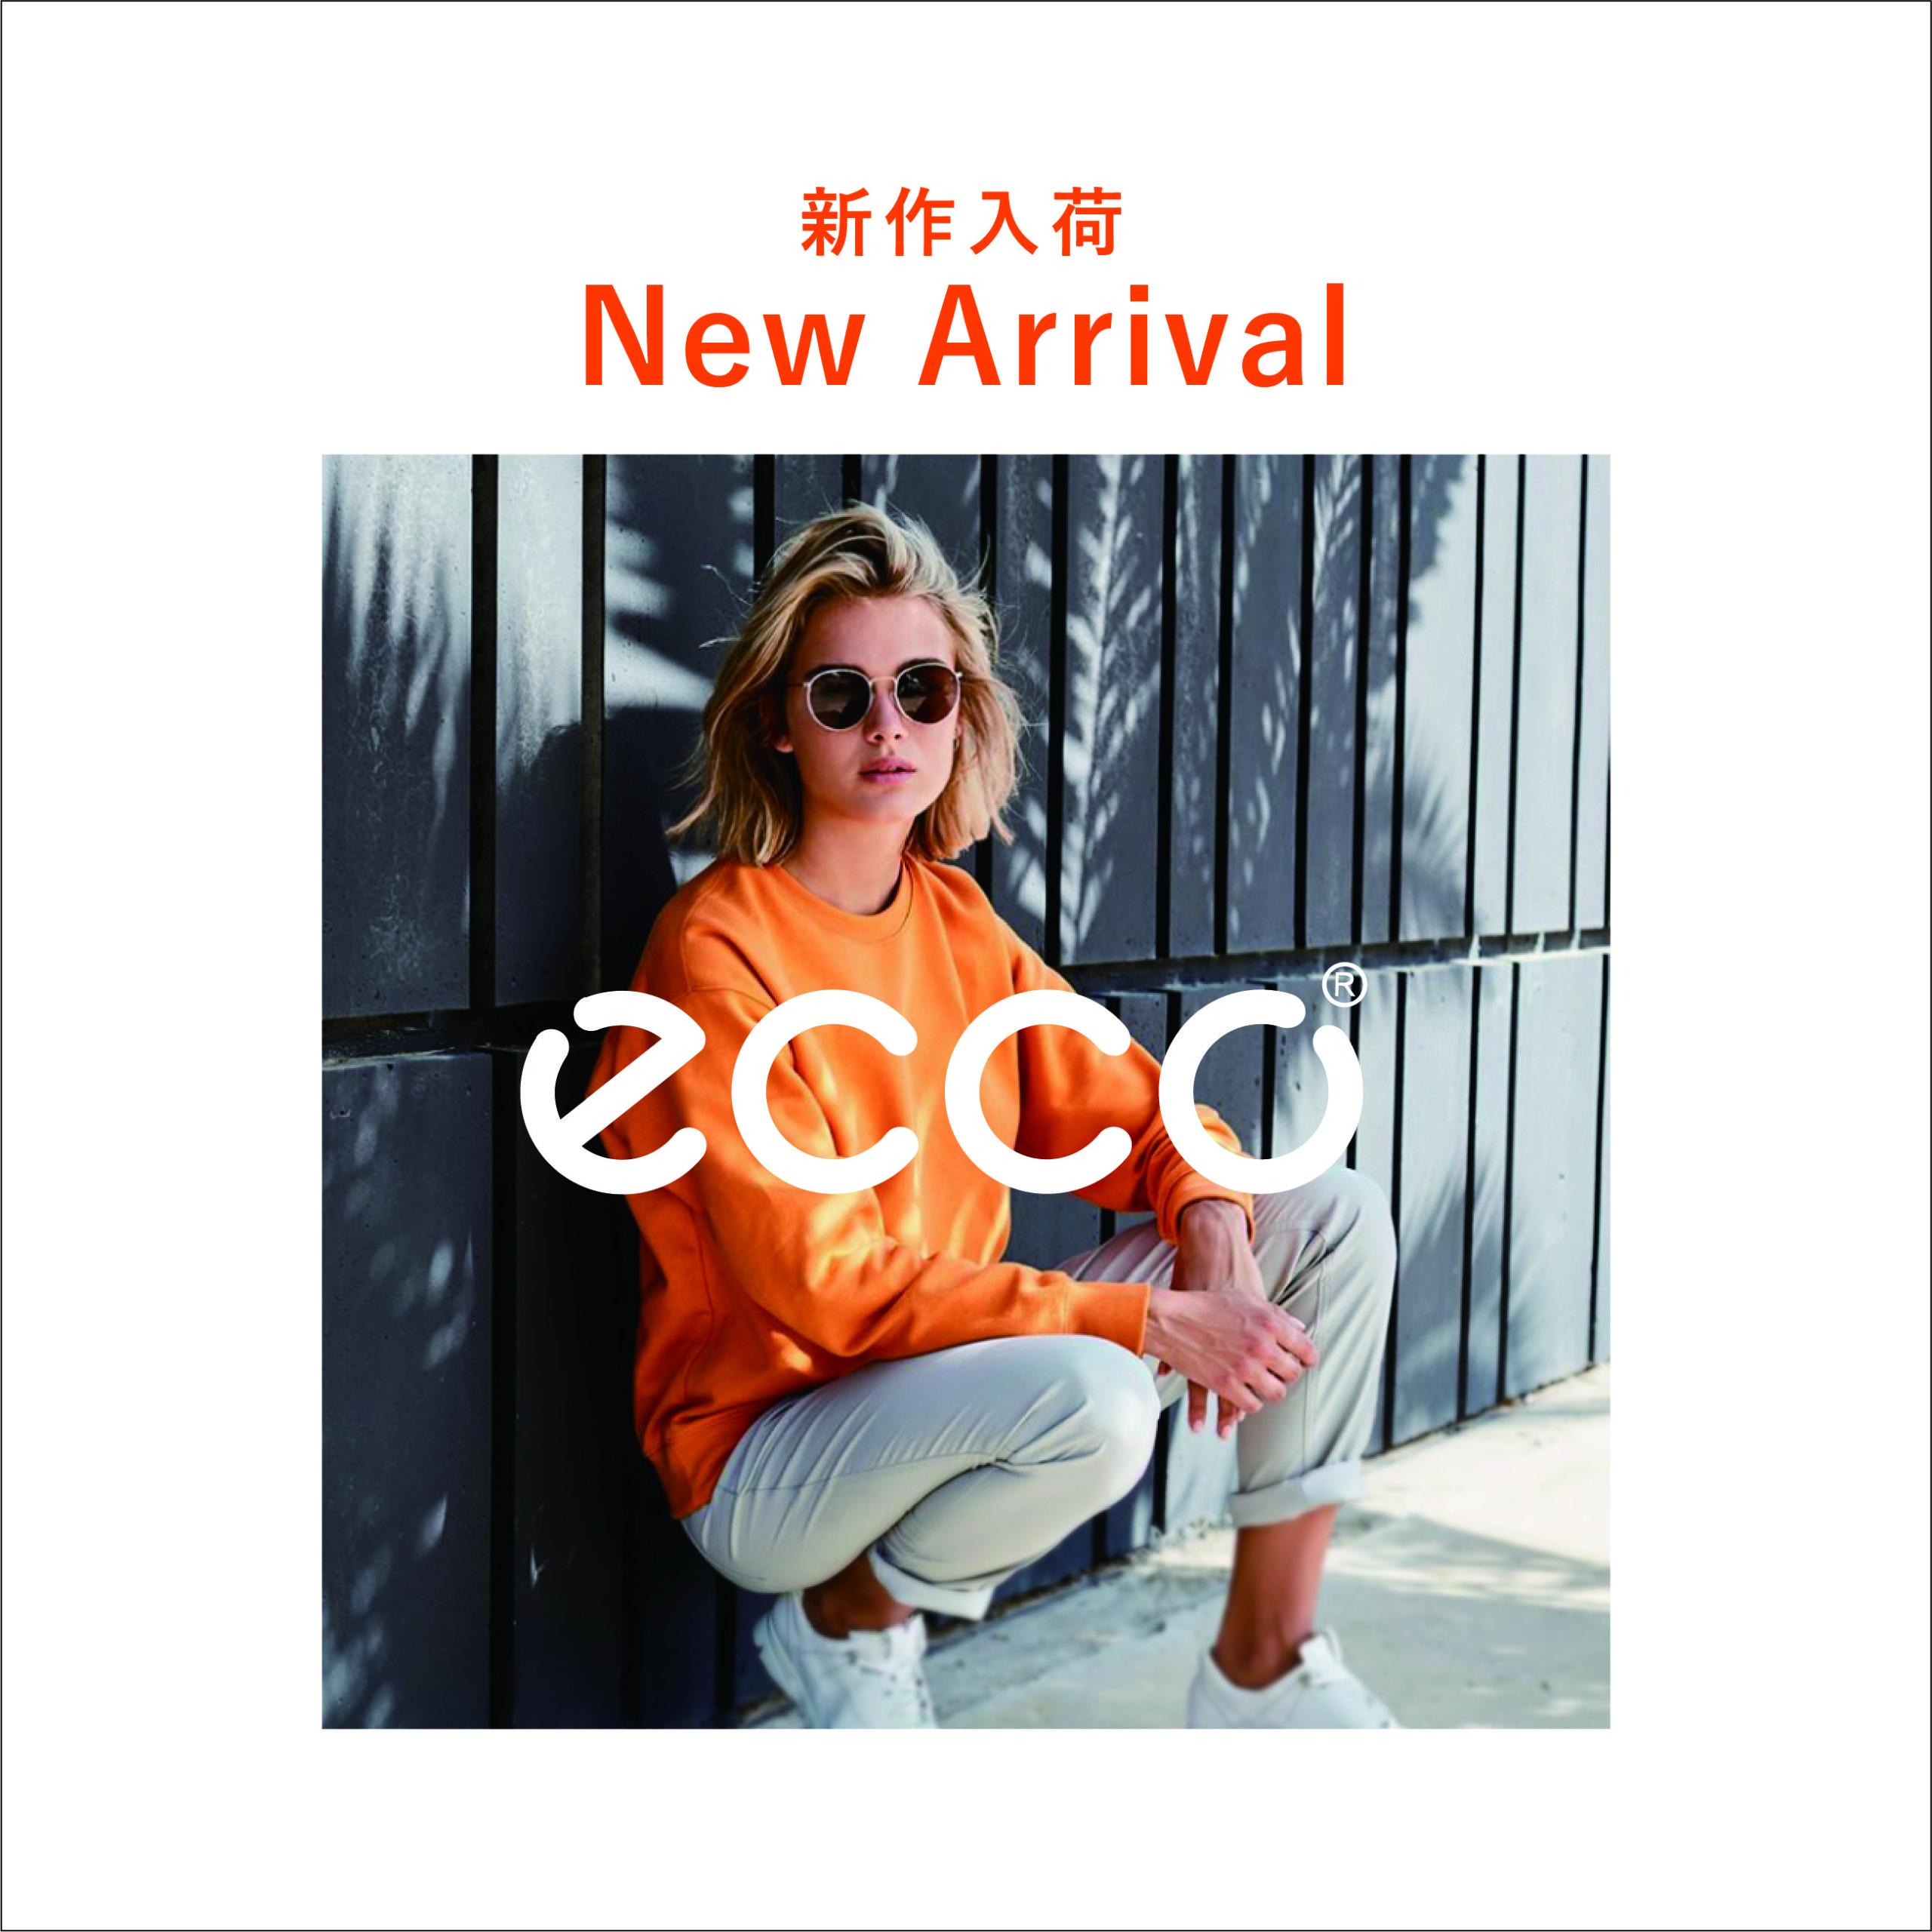 【FAVO店】ECCO新作商品のご紹介